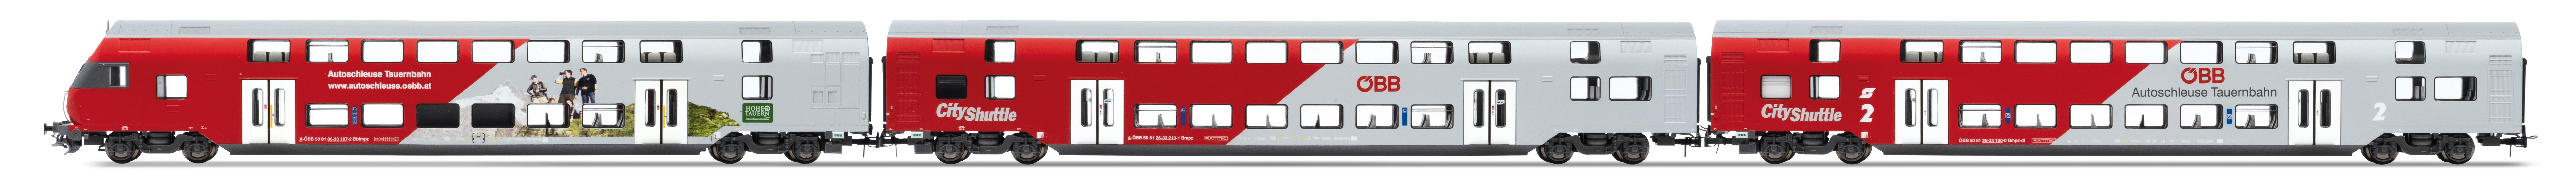 JC60430